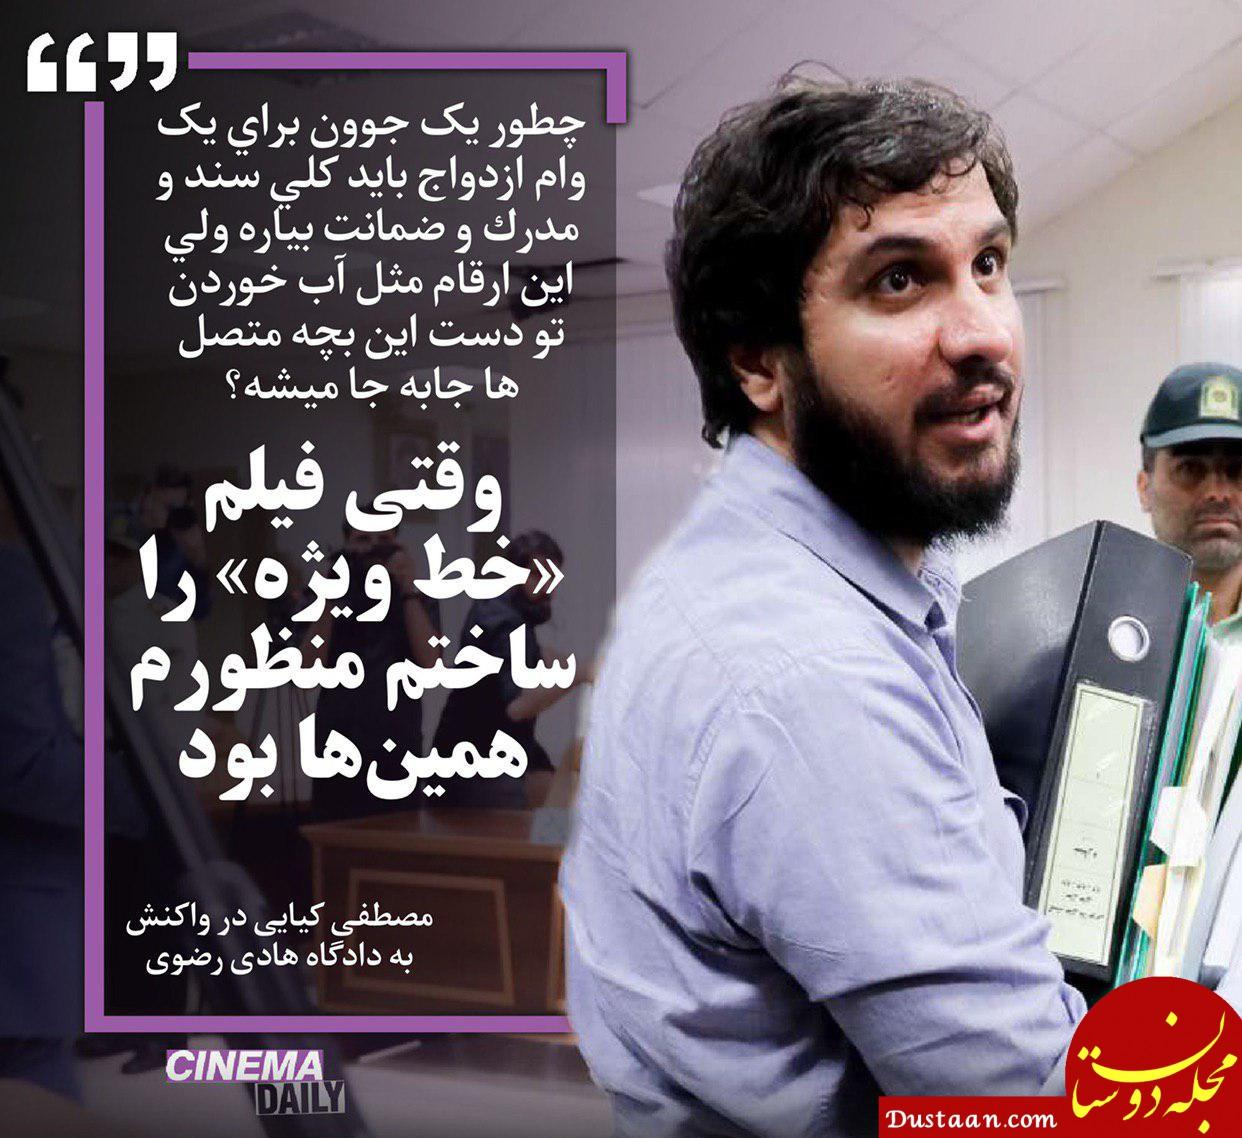 www.dustaan.com واکنش جالب مصطفی کیایی به دادگاه هادی رضوی